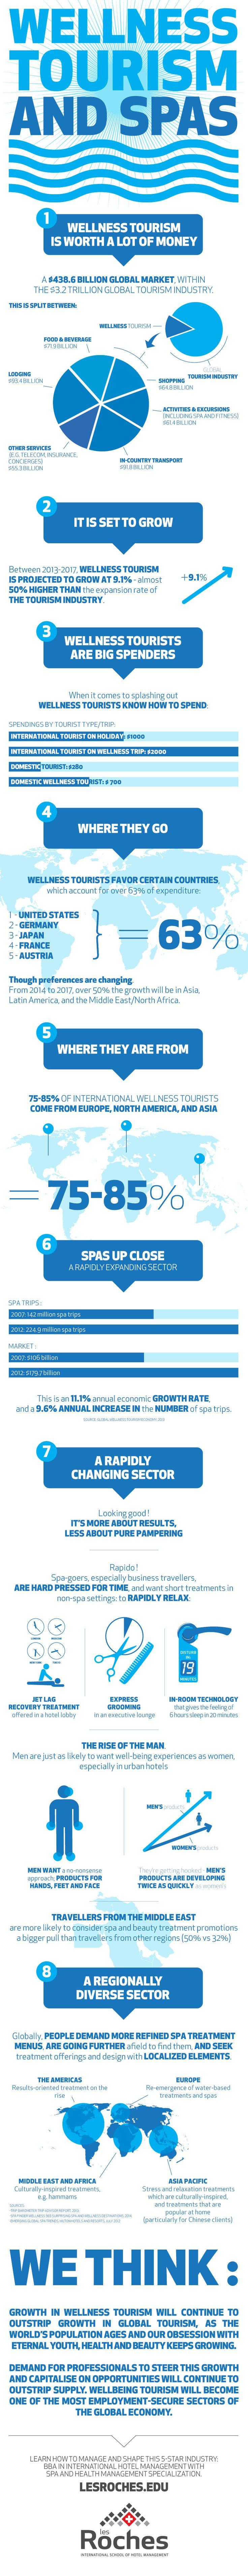 Infographic: Wellness, Tourism & Spas ~ http://www.hospitalitynet.org/news/4067035.html via @HospitalityNet @LesRochesNews #wellness #spa